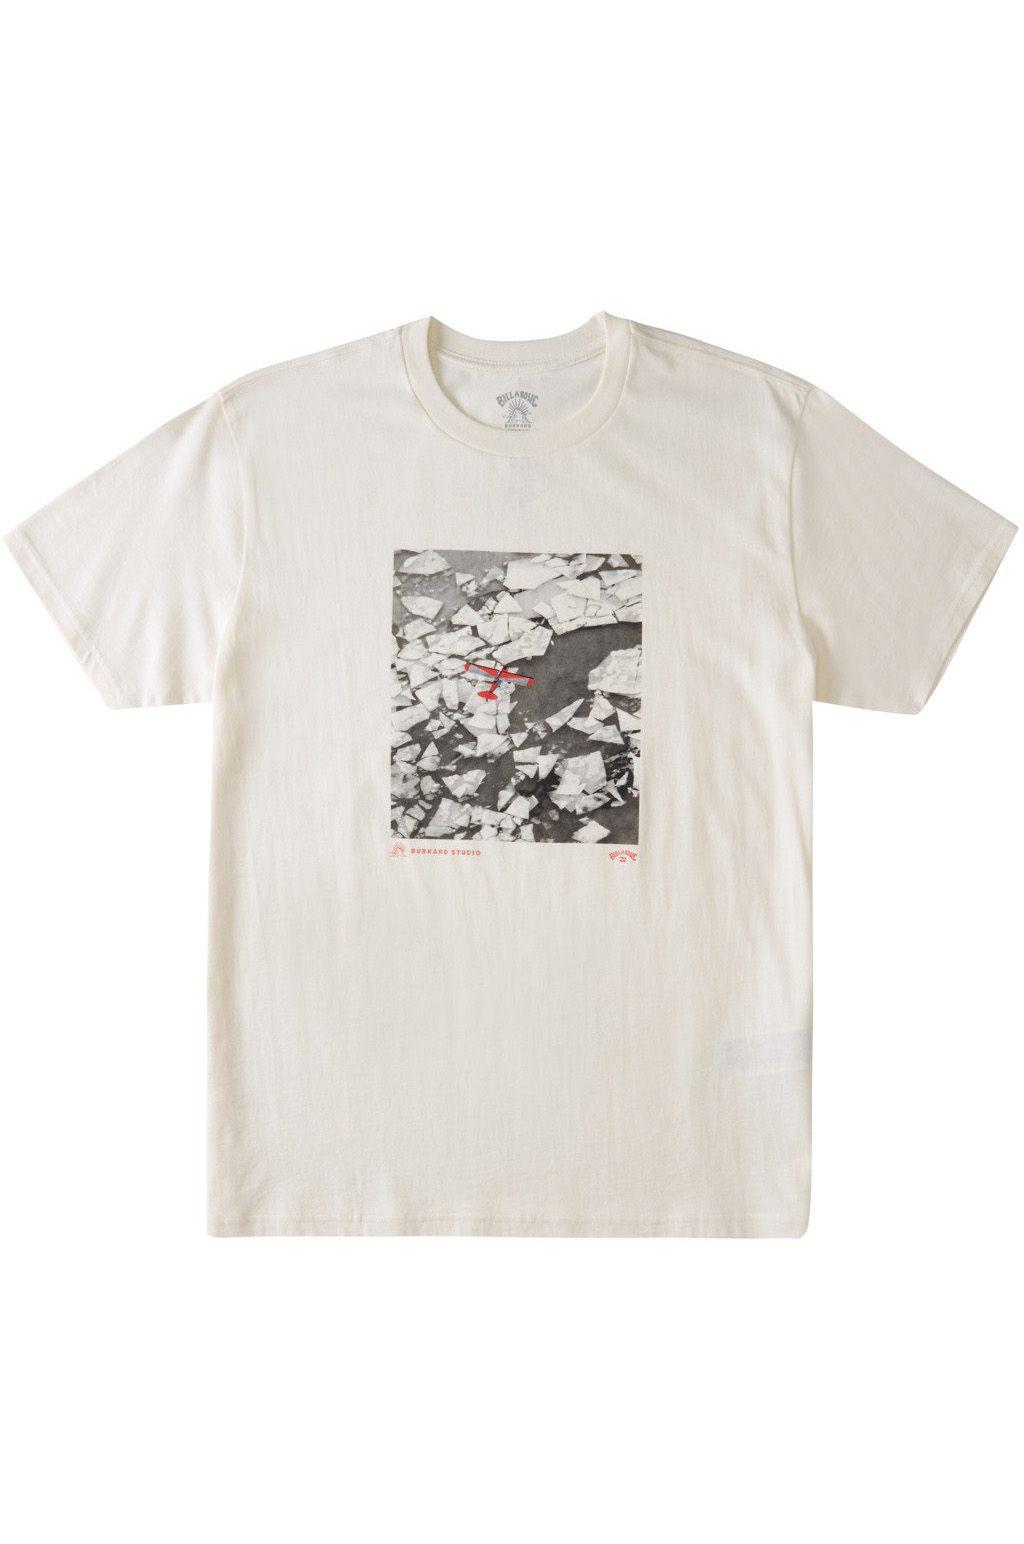 Billabong T-Shirt ICEBURG AERIAL SS ADIV / CHRIS BURKARD Snow